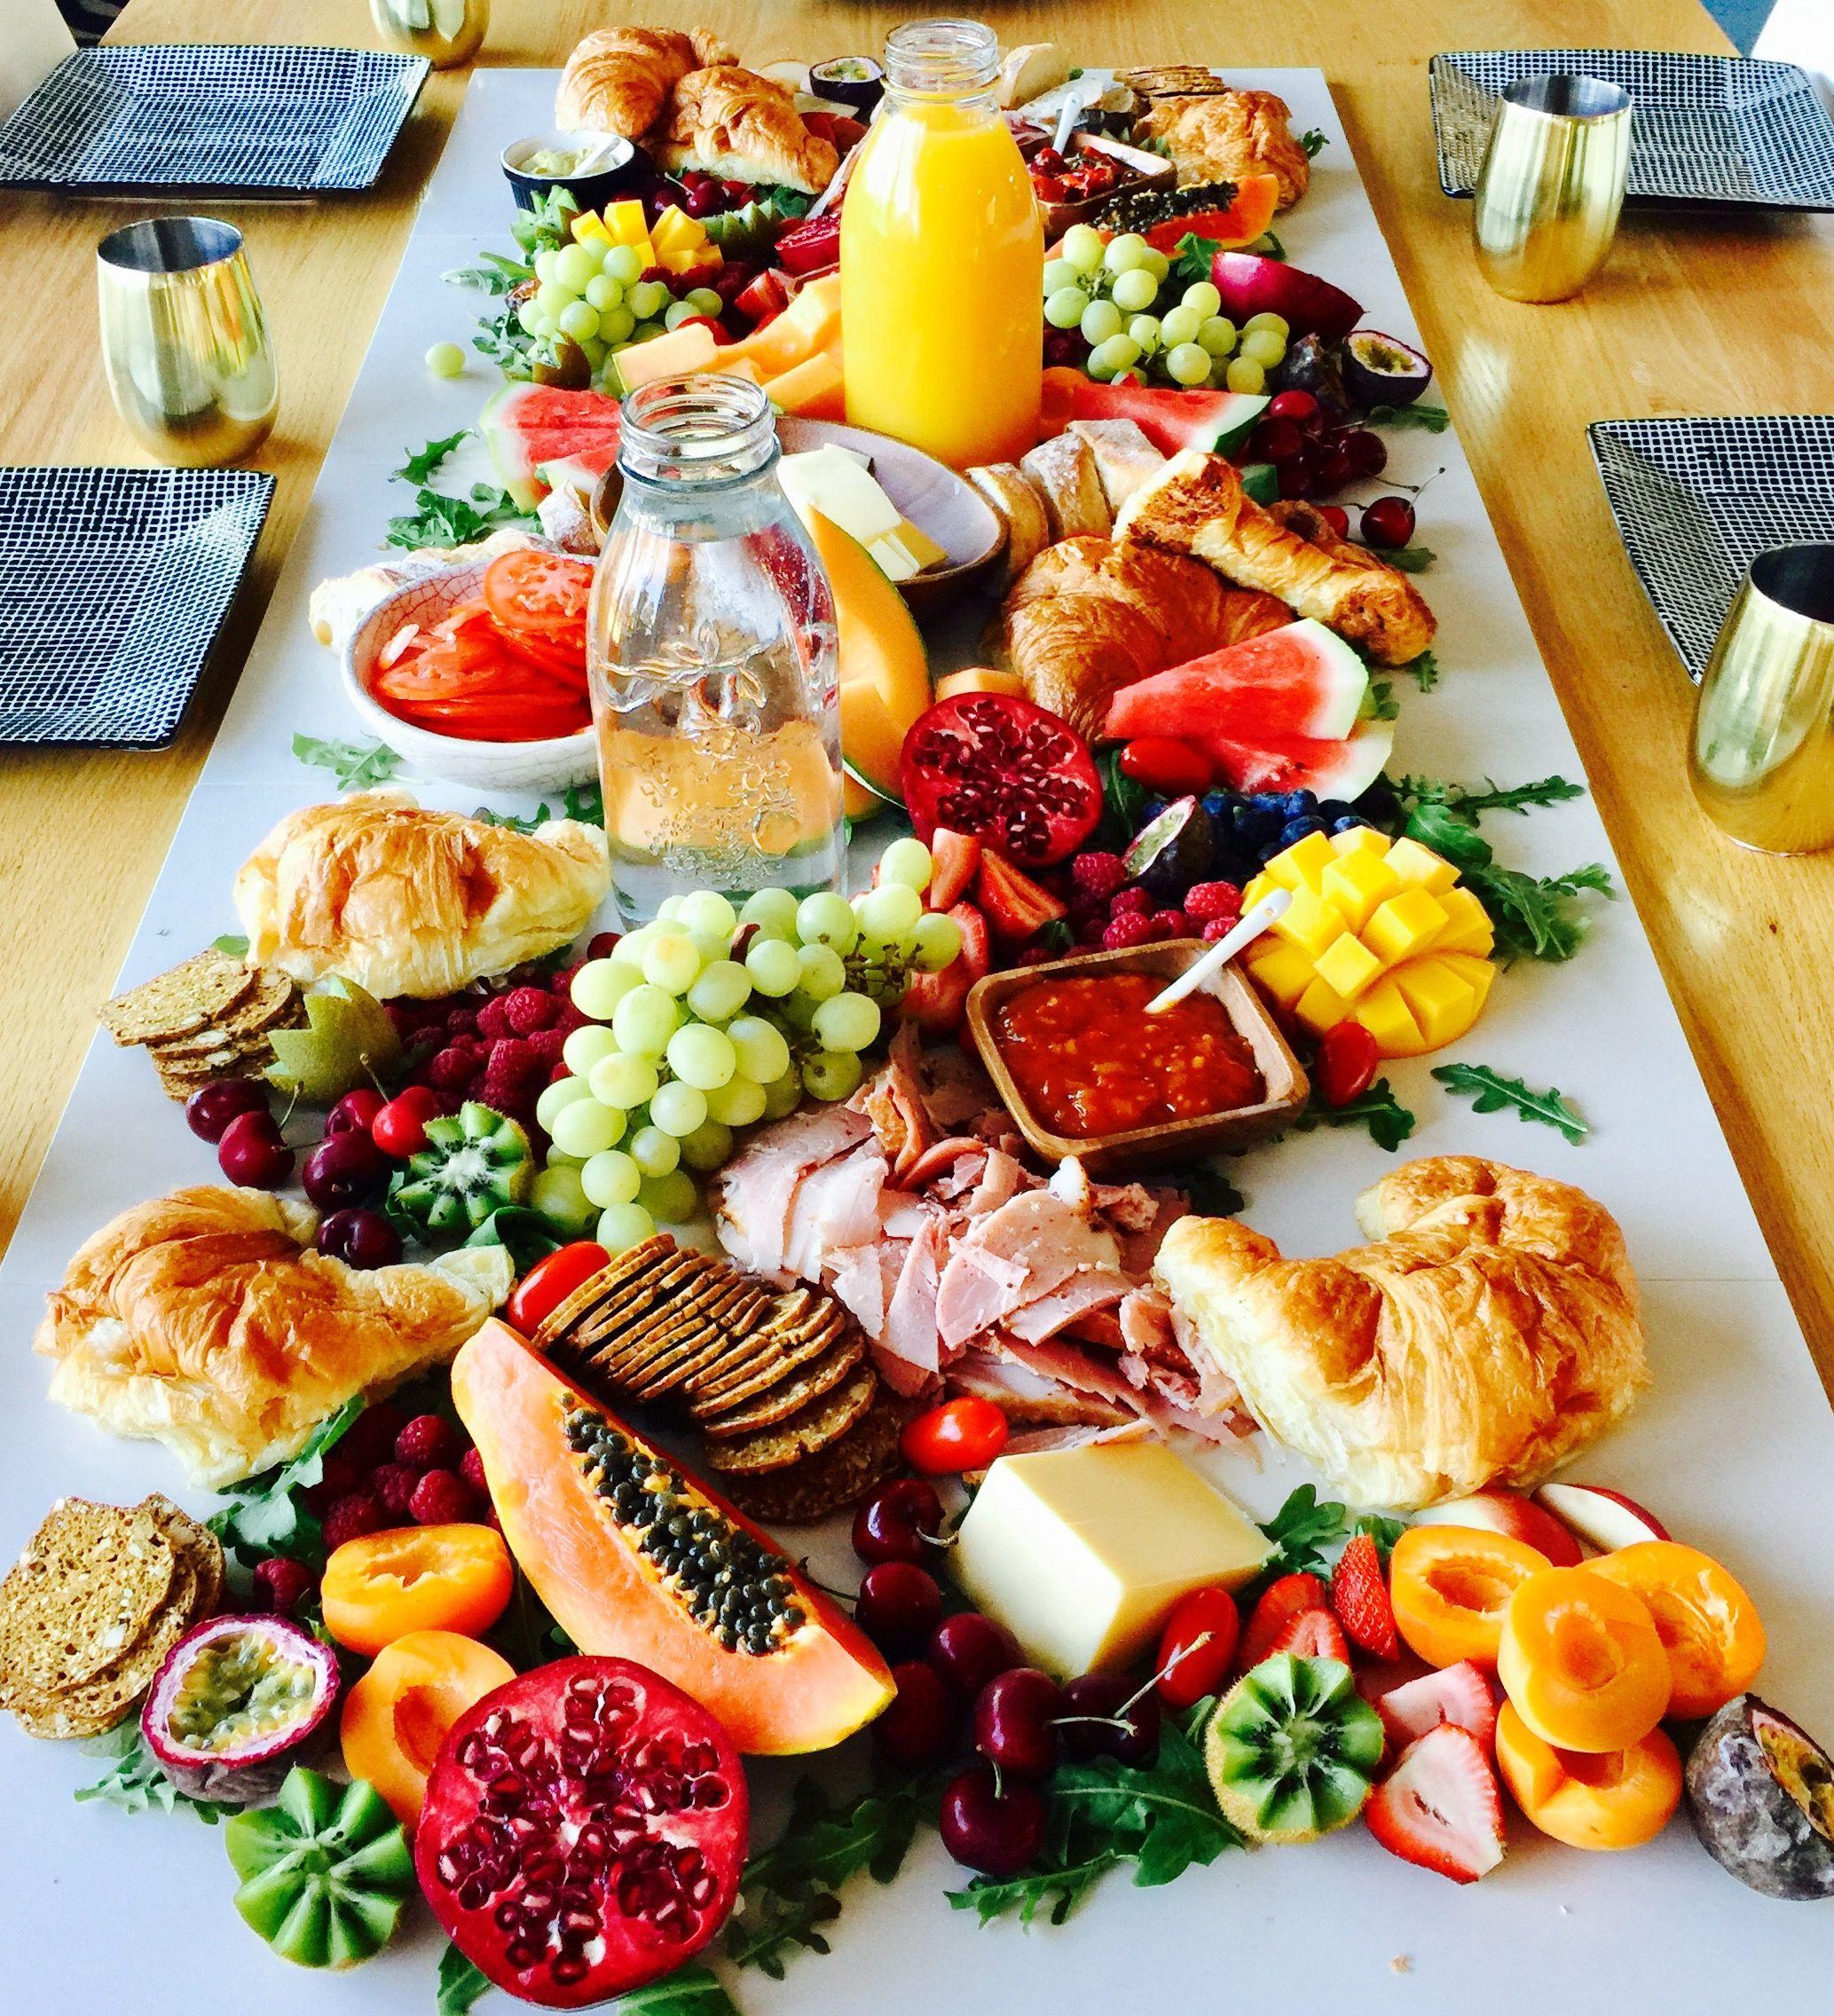 Christmas Breakfast Platter 2016 Christmasfood Fruitplatter Summer Australia Christmas Breakfa In 2020 Breakfast Platter Christmas Breakfast Breakfast Buffet